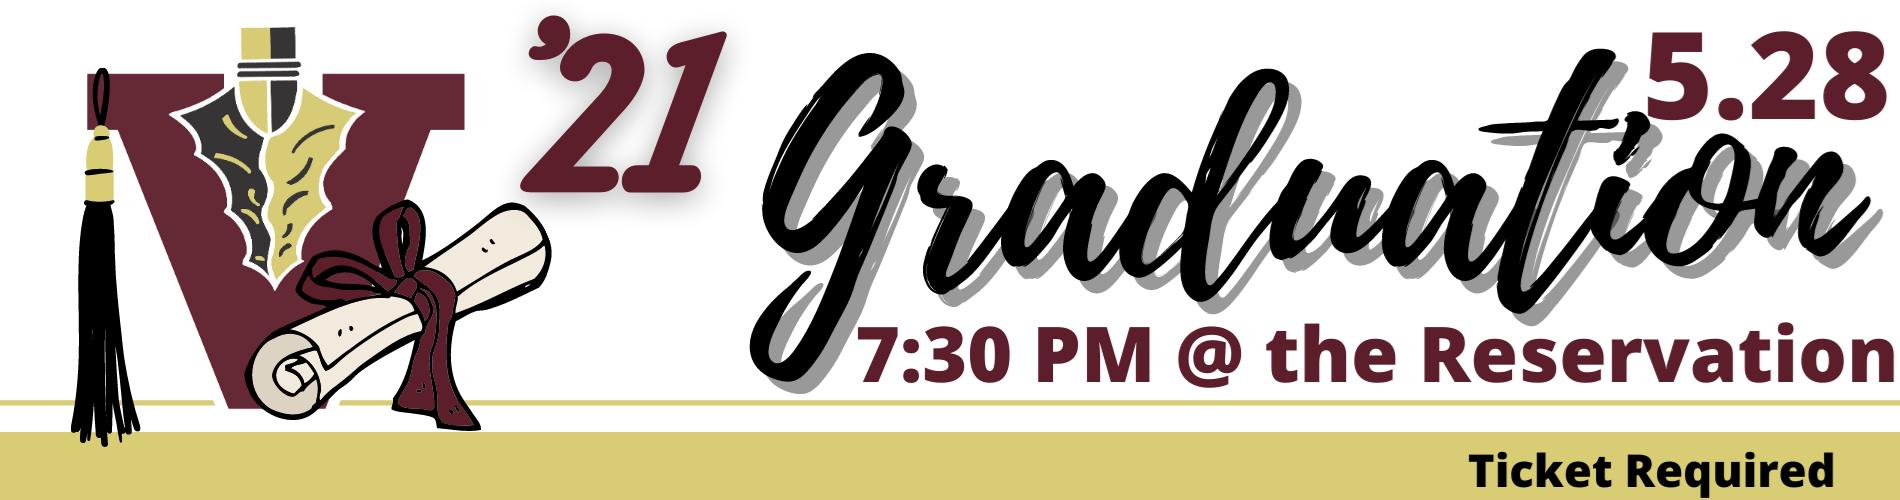 Graduation 2021 7:30 @ the Reservation